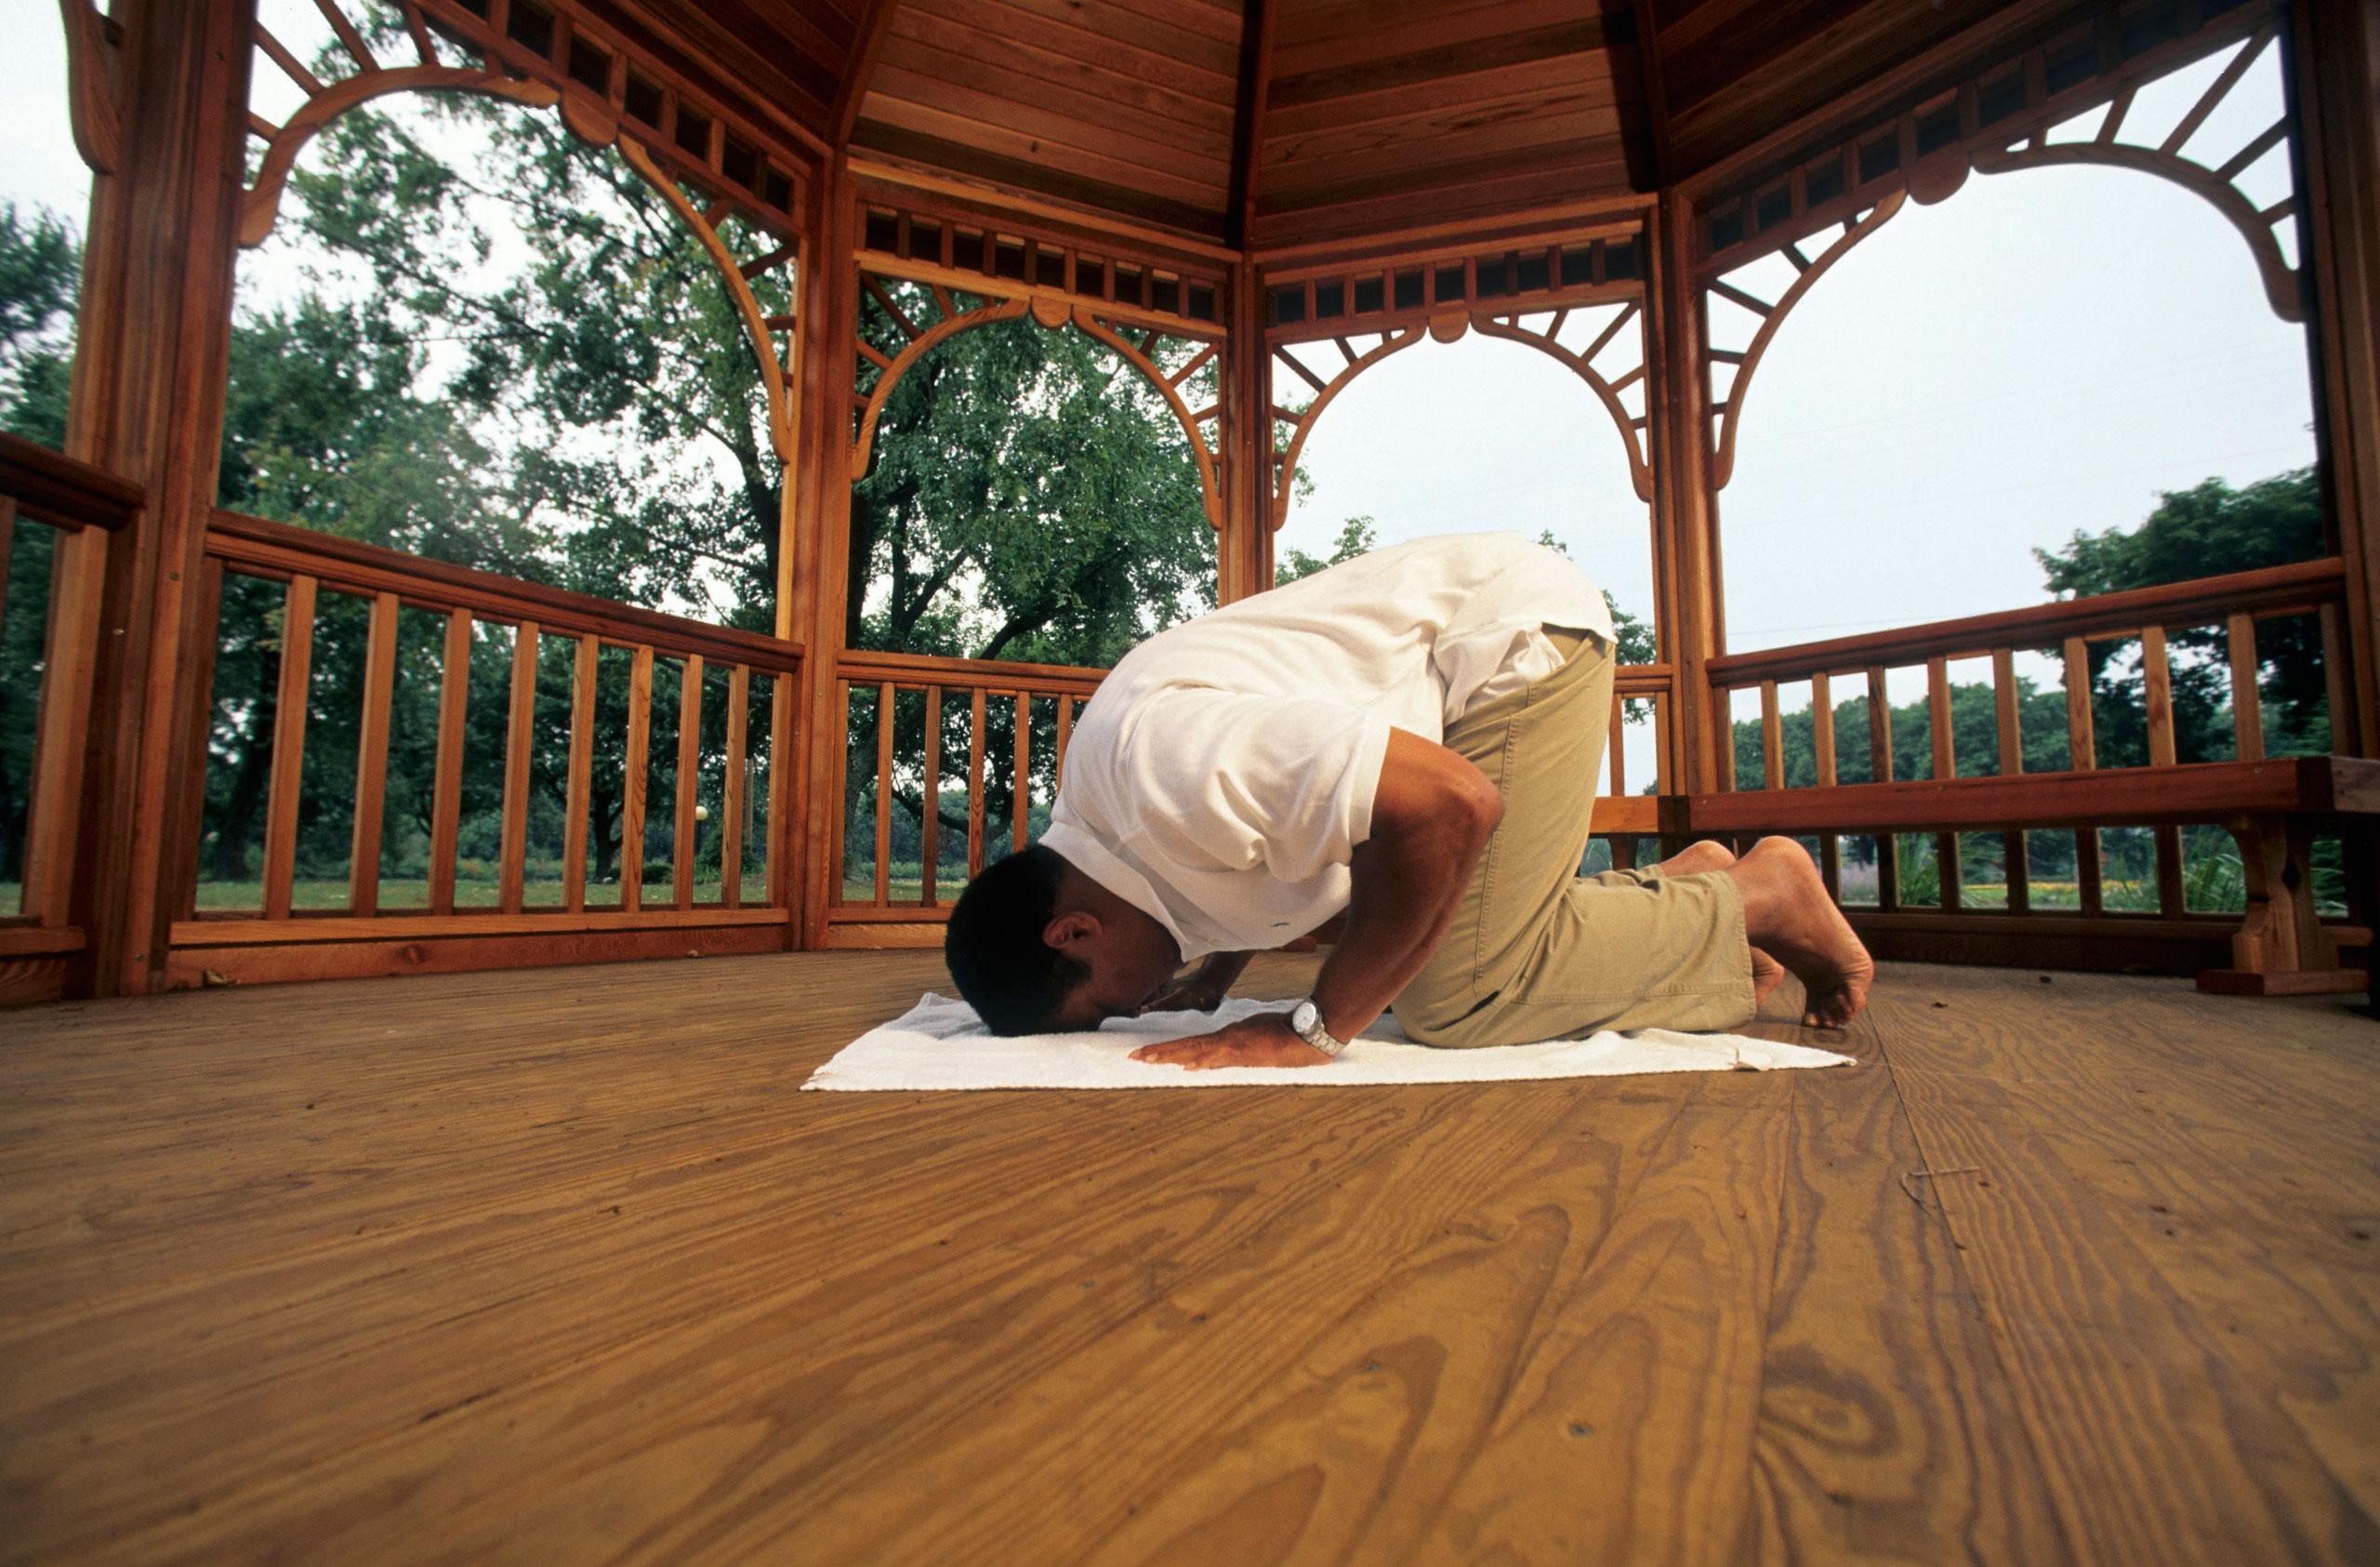 Muhammad Ali prays on a gazebo at his farm in Berrien Springs, Mich., on Sept. 10, 1996.